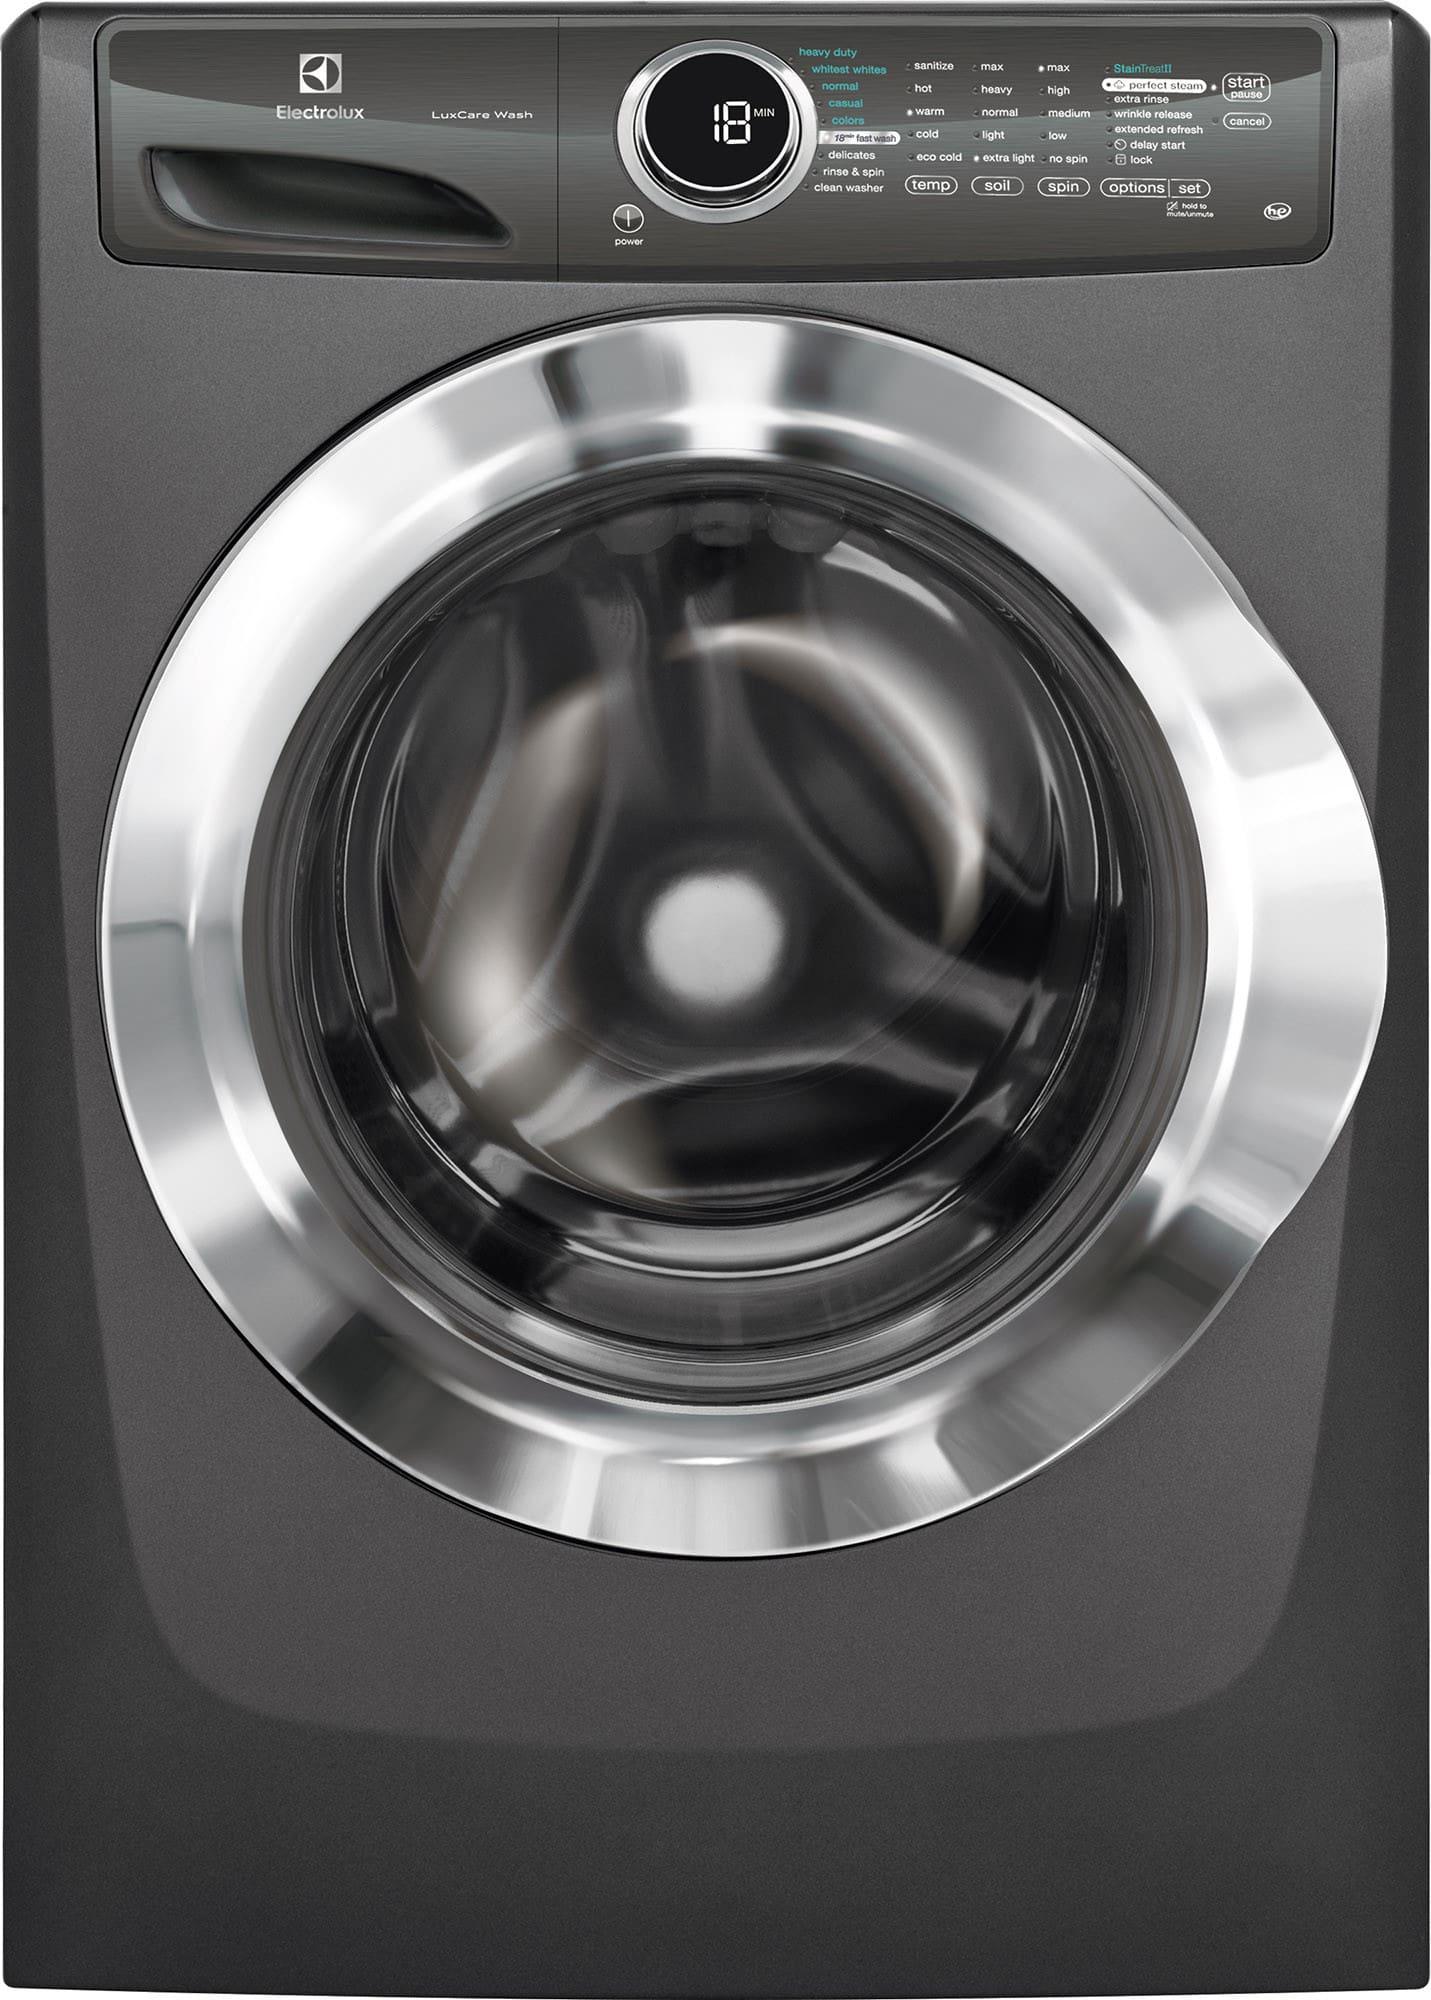 product seriesprofile details electrolux storage hei ge wid profile prod series laundry pedestal spin d jsp sharpen op